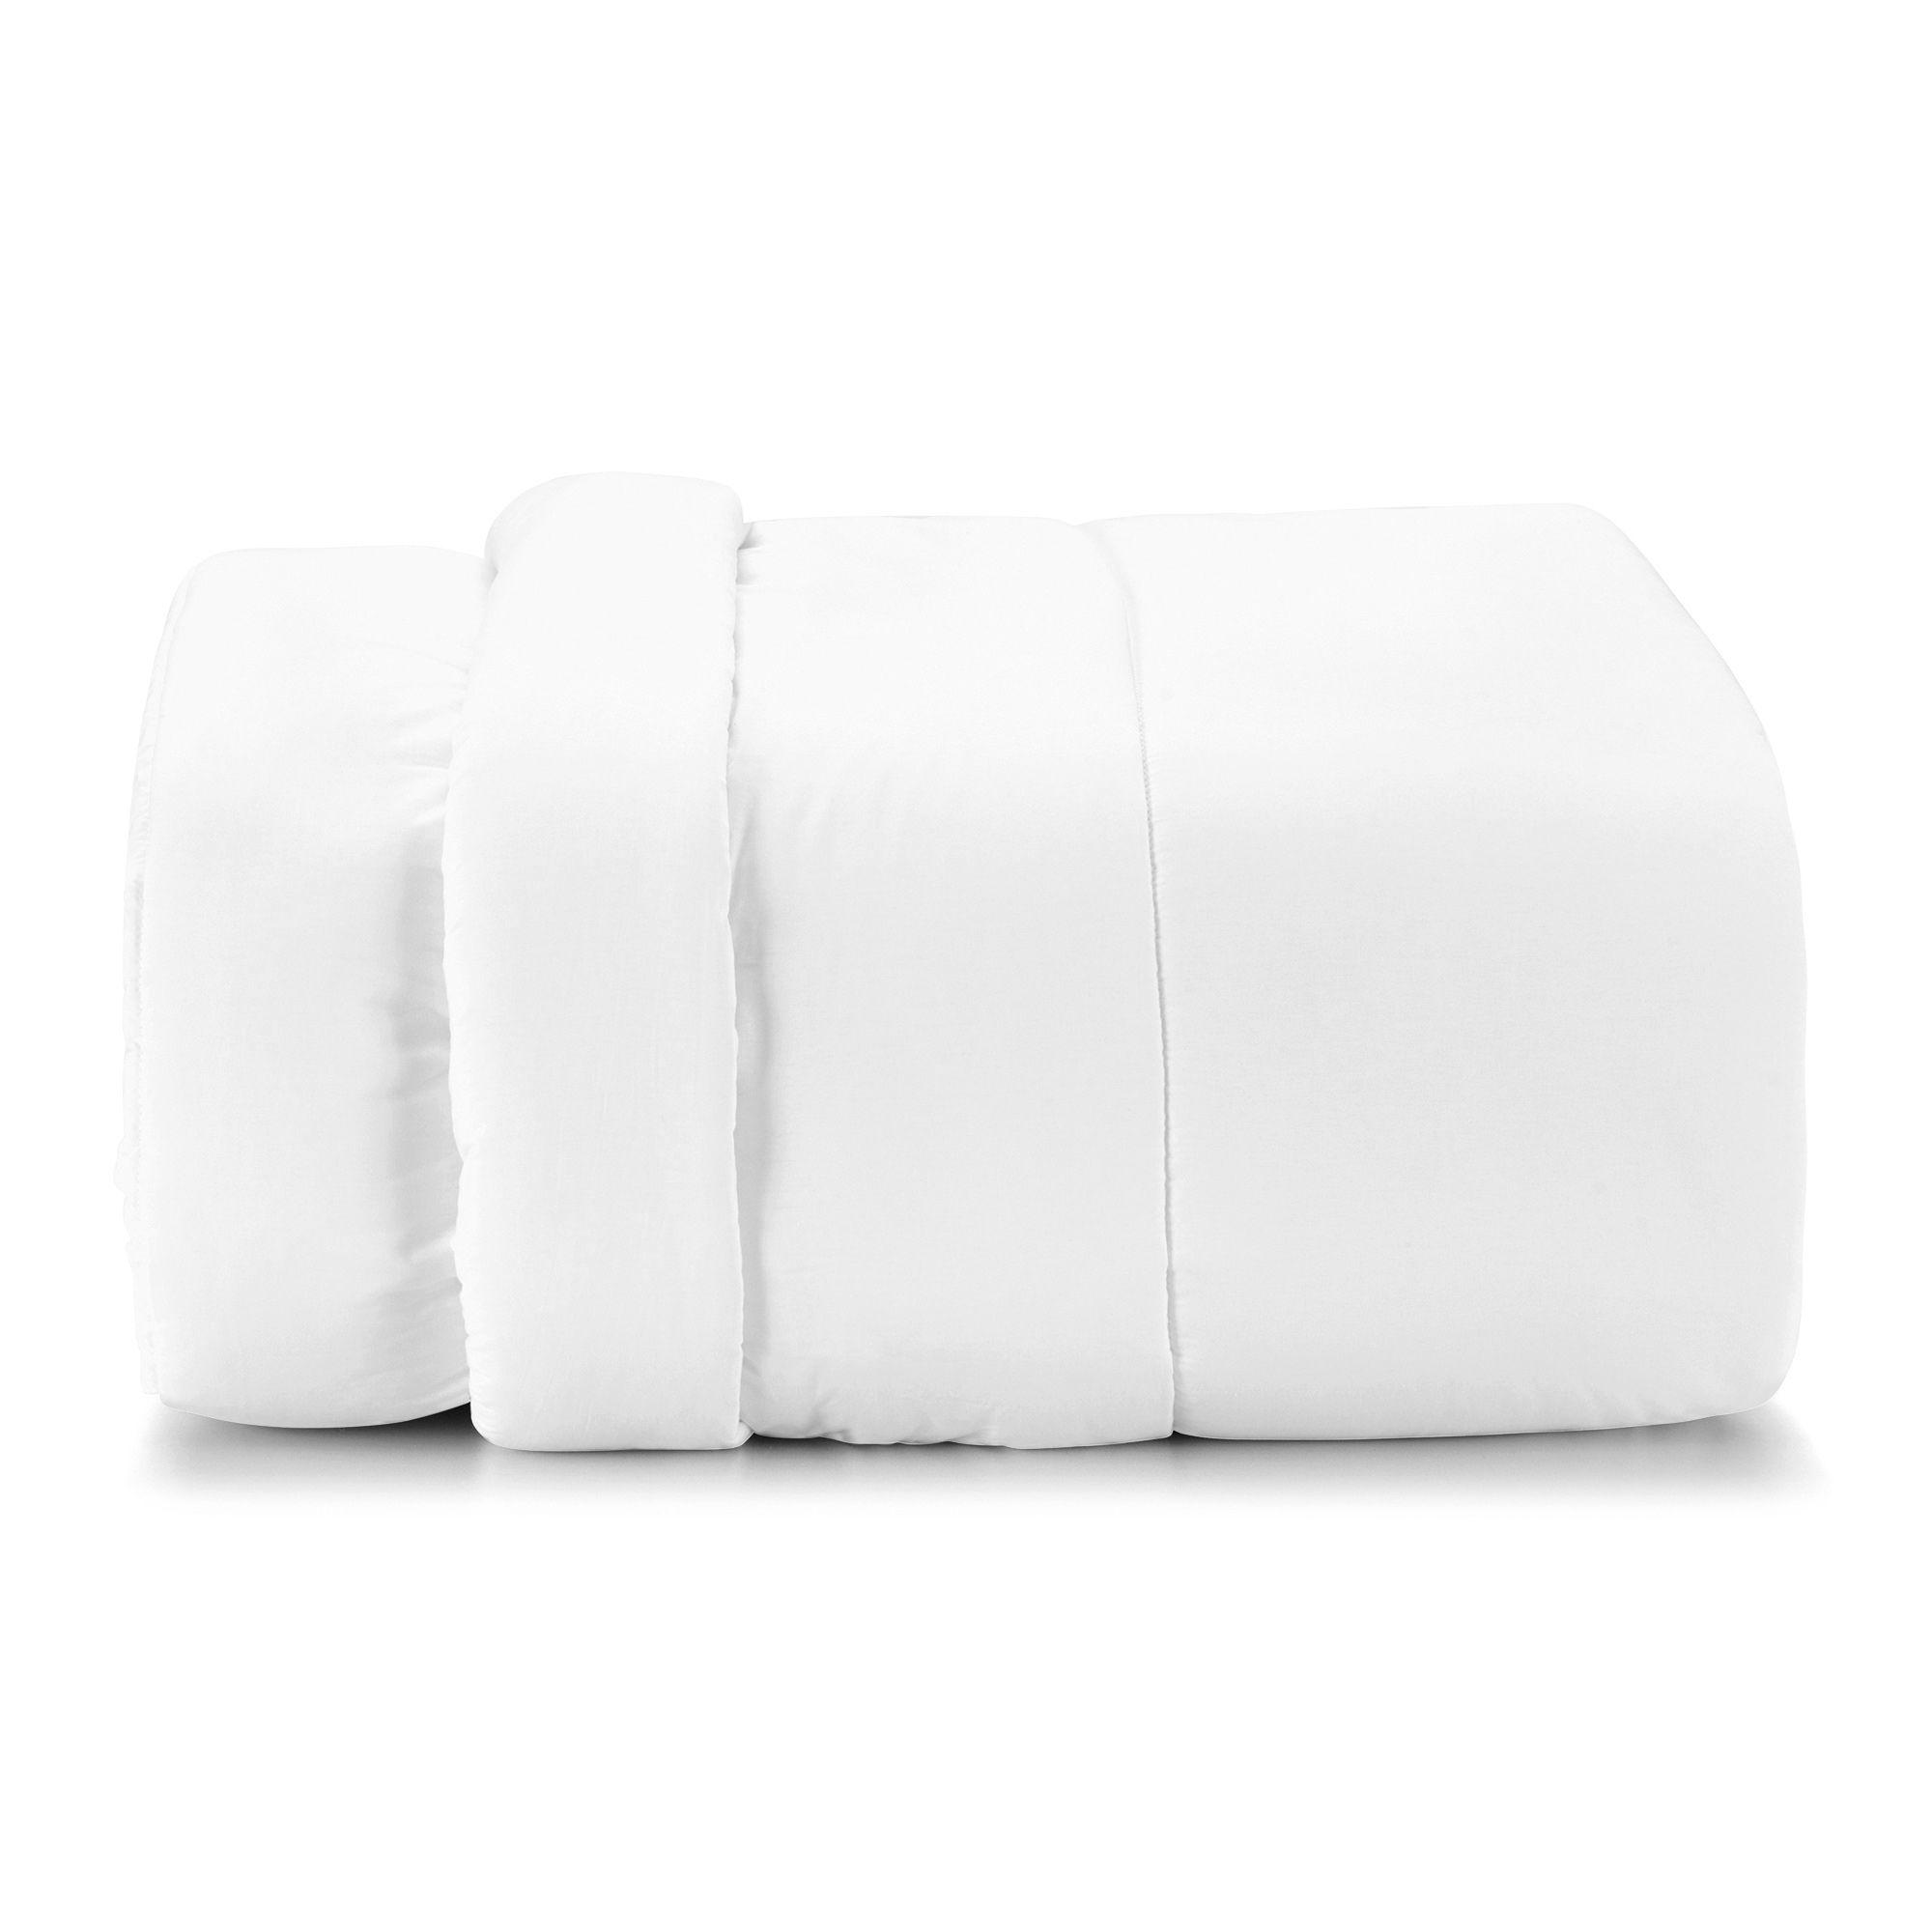 Edredom Karsten Casal Queen Liss Branco 100% Algodão